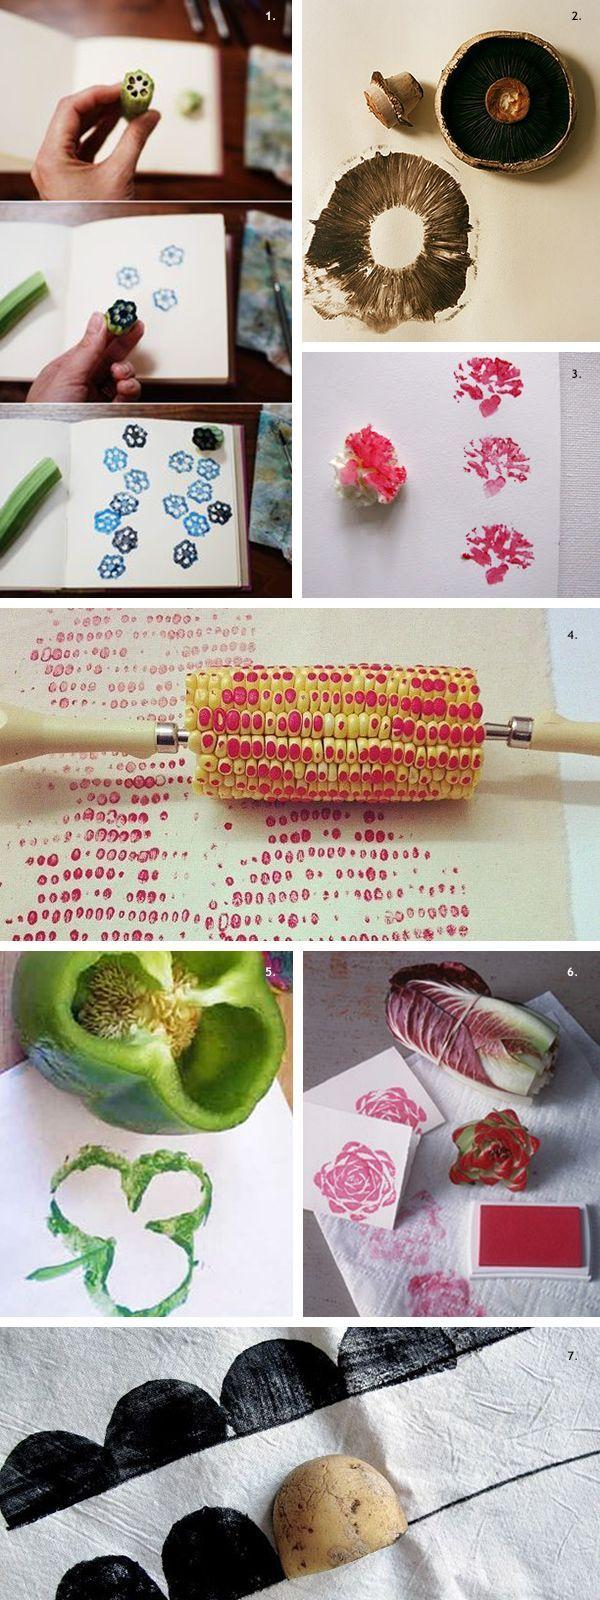 DIY veggie stamps | Pinterest | Diy wall art, Diy wall and Stamps